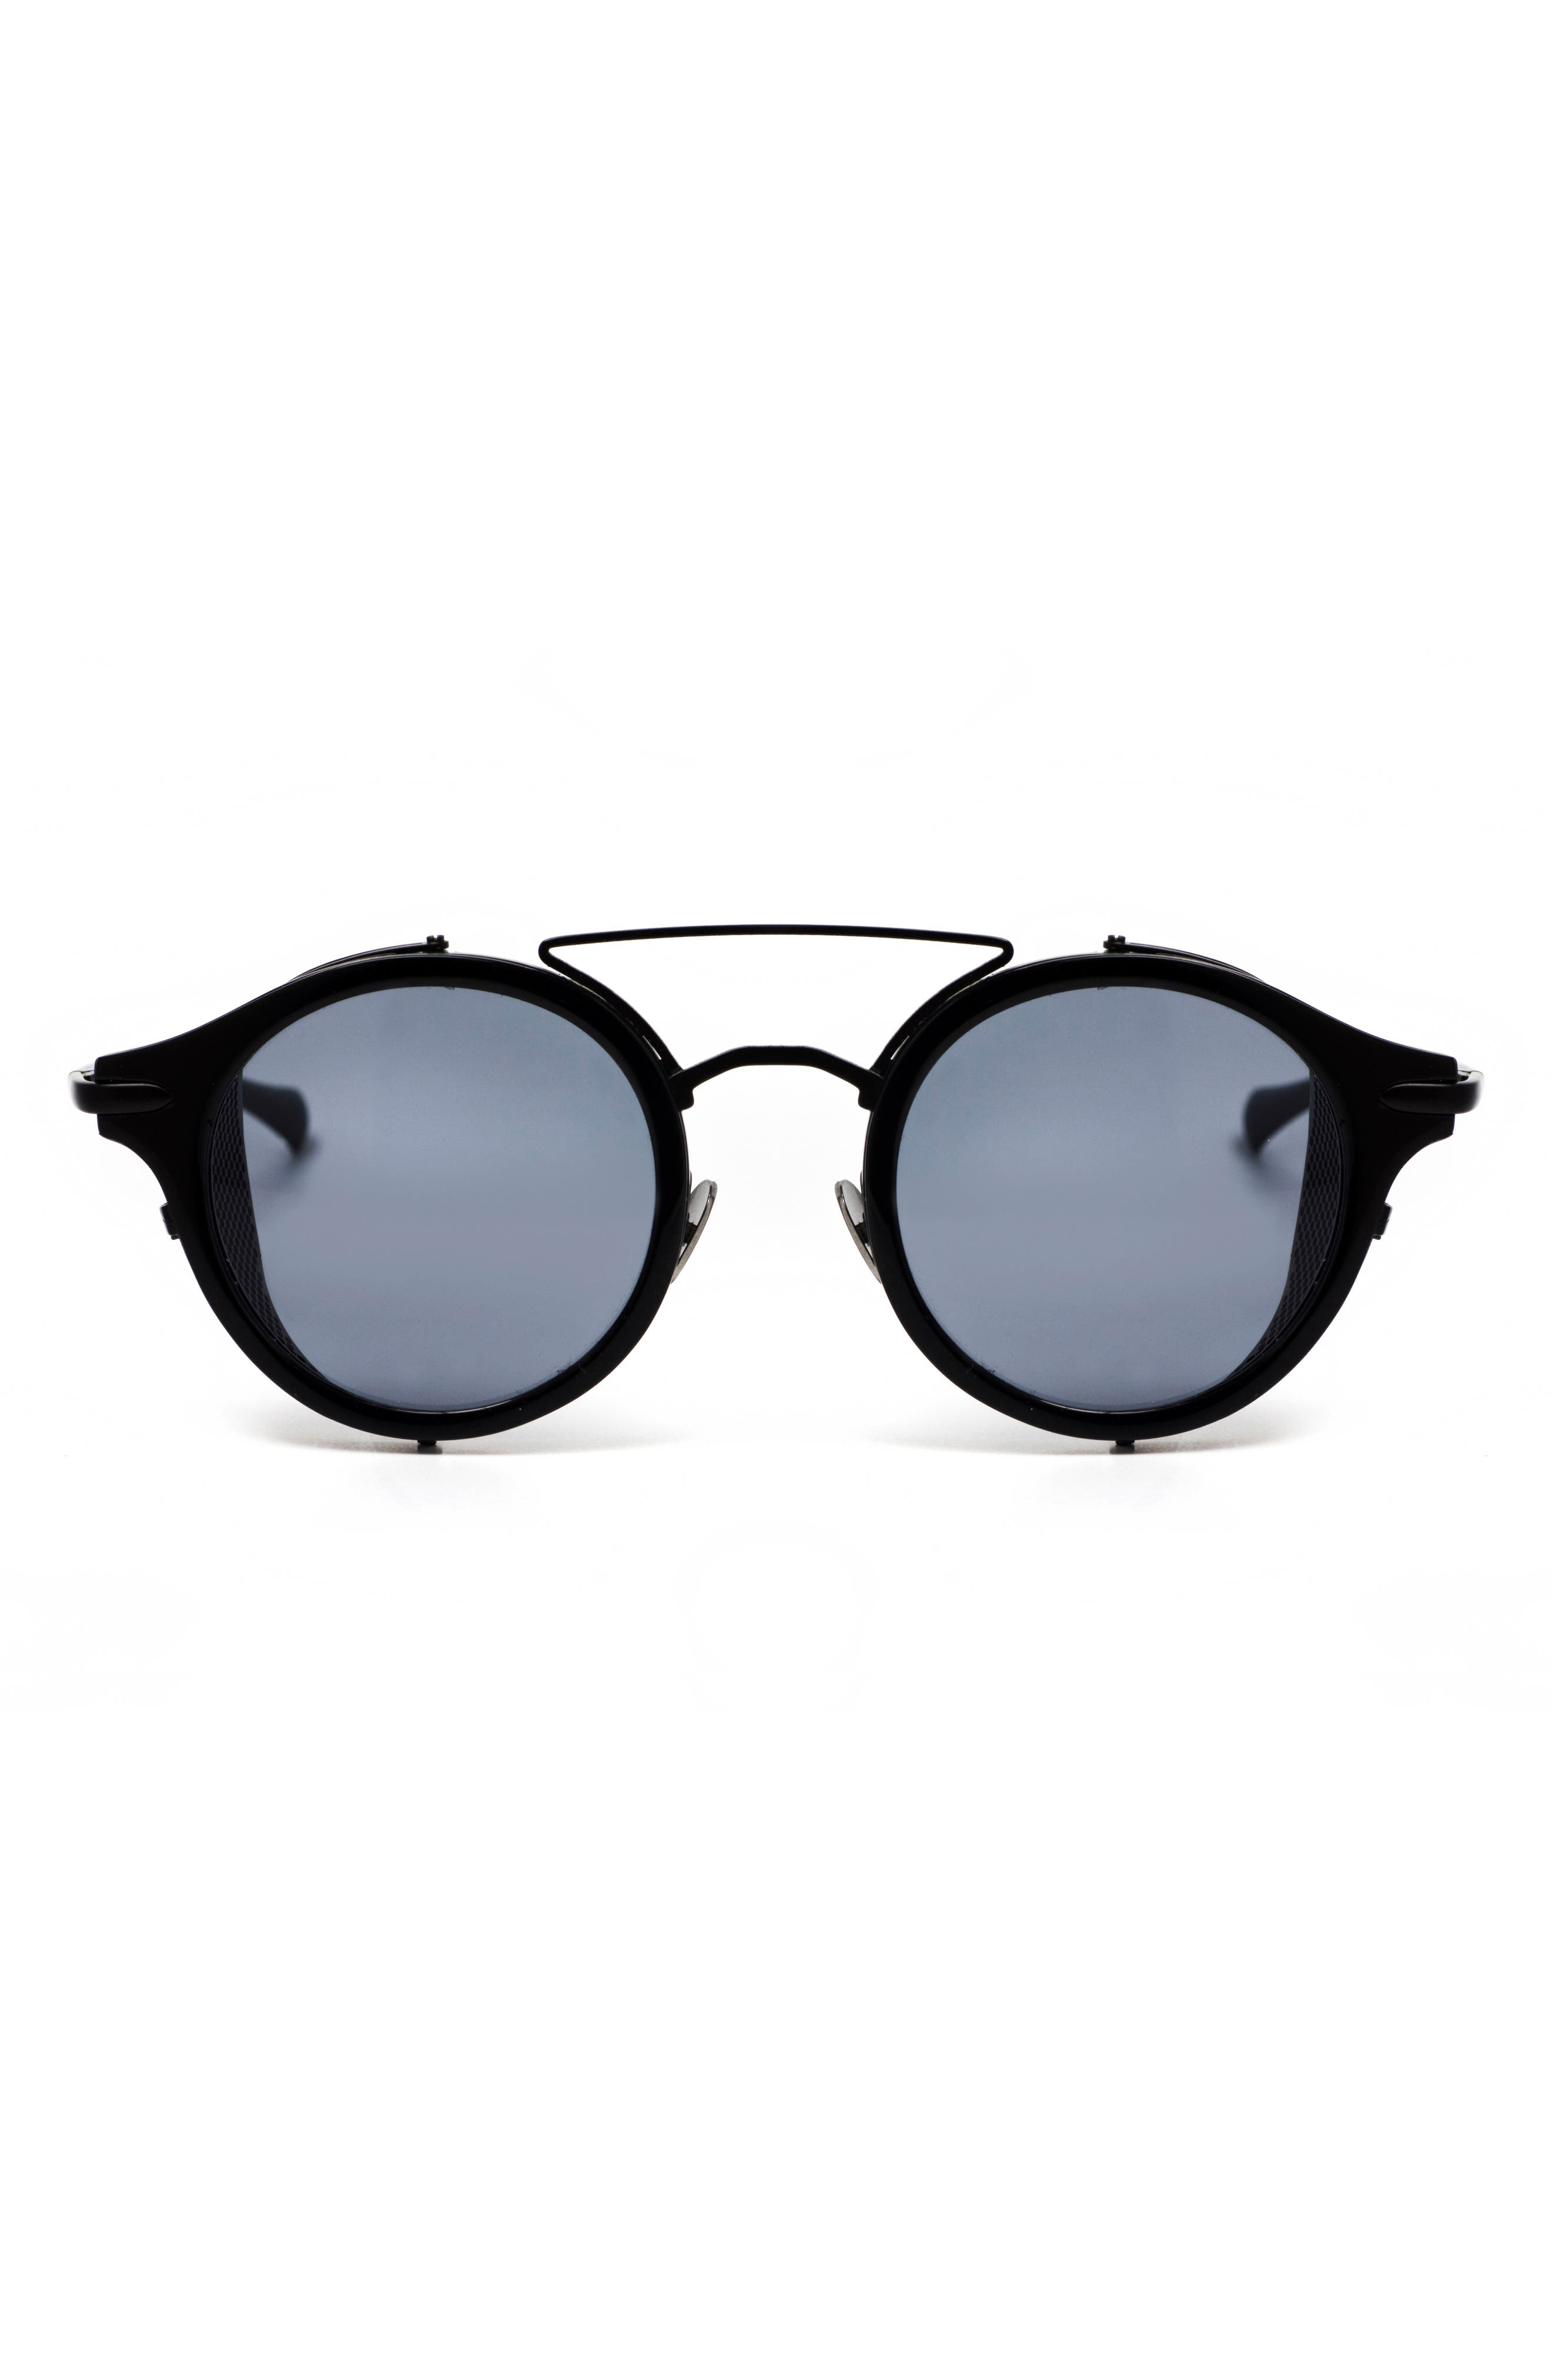 Mile High 47mm Sunglasses,                             Alternate thumbnail 3, color,                             001